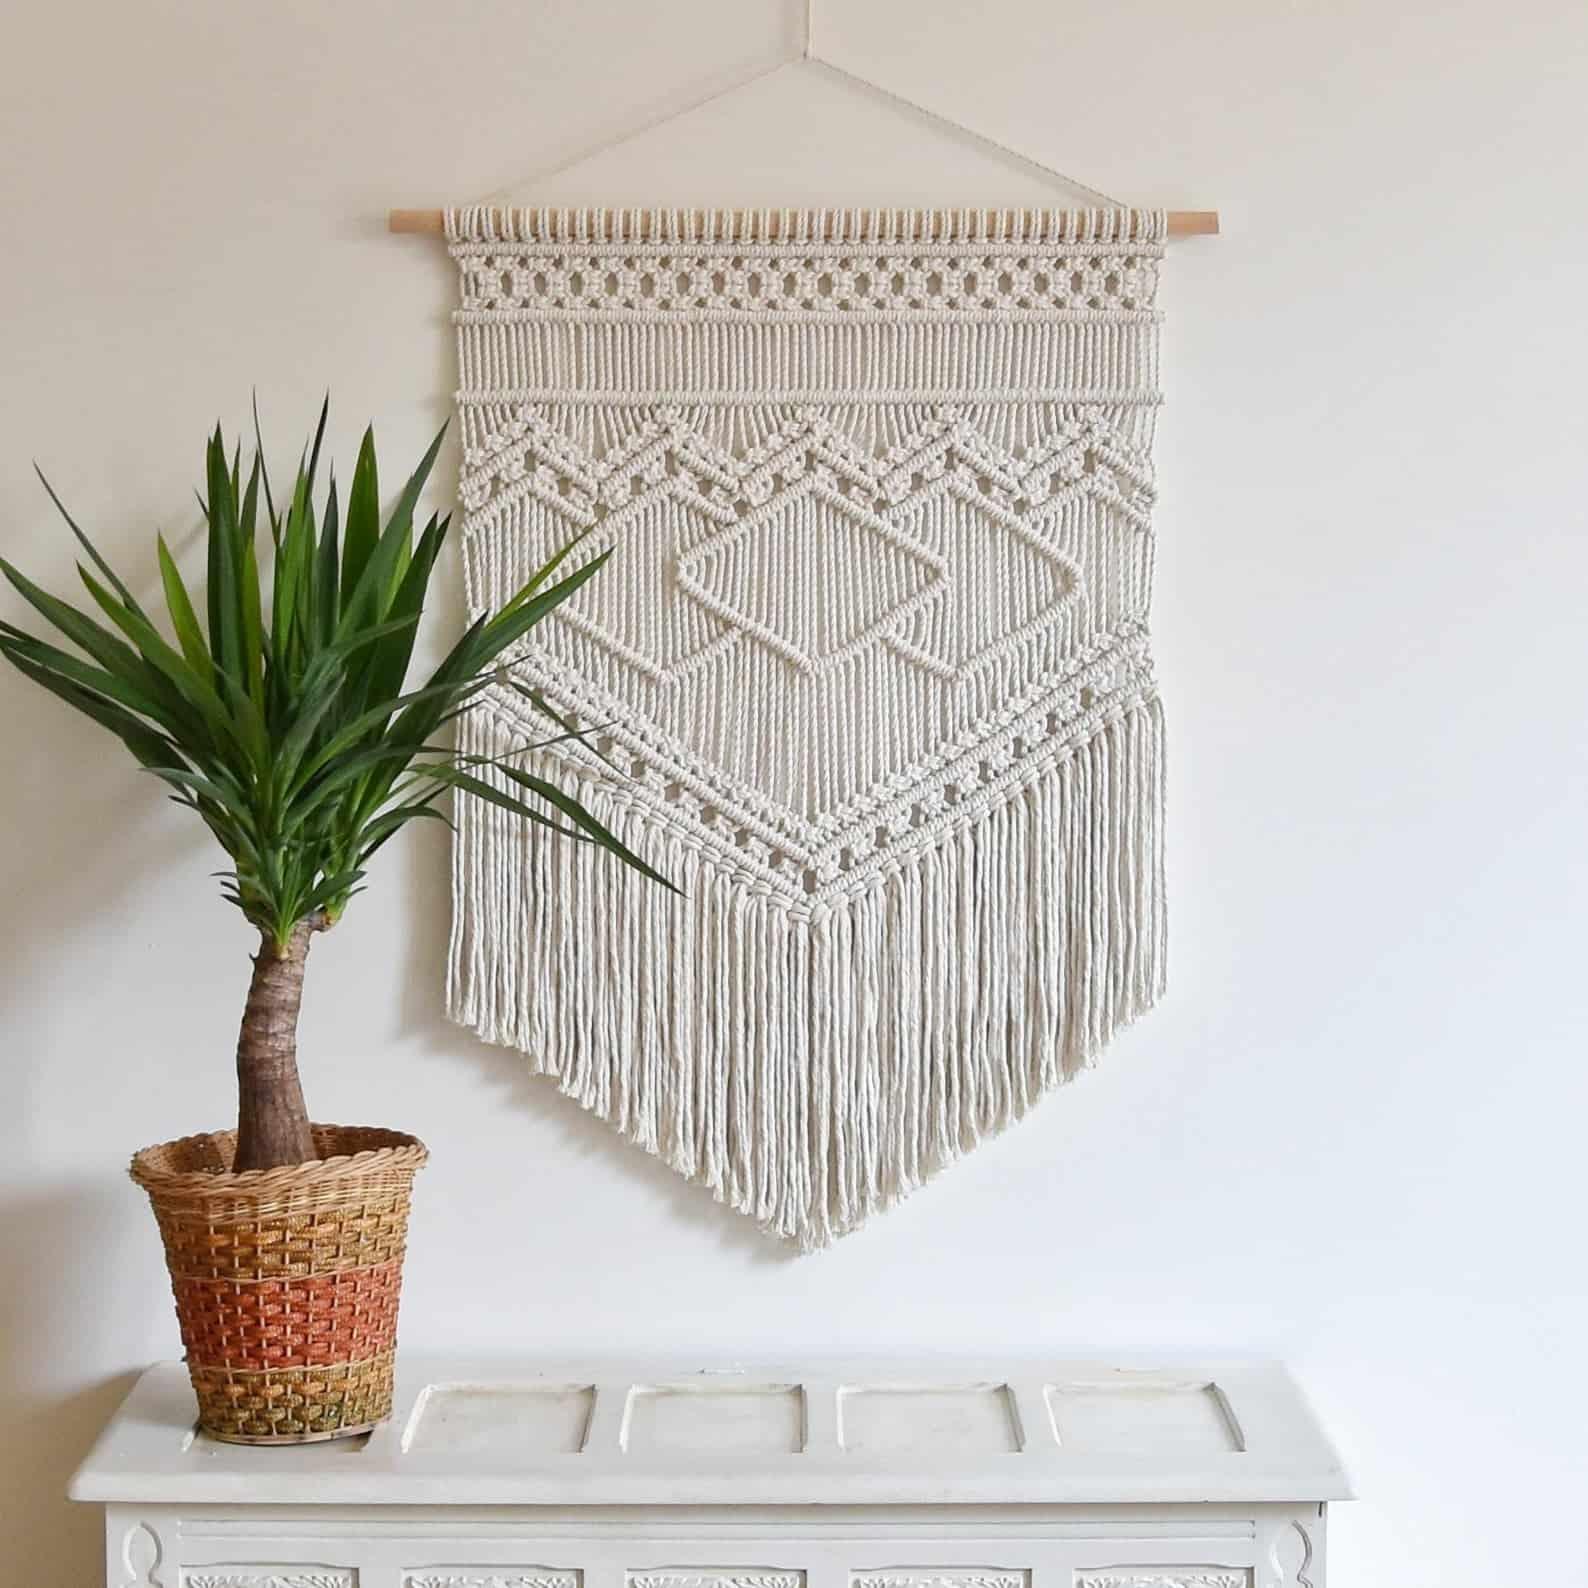 Azurite macrame pattern wall hanging